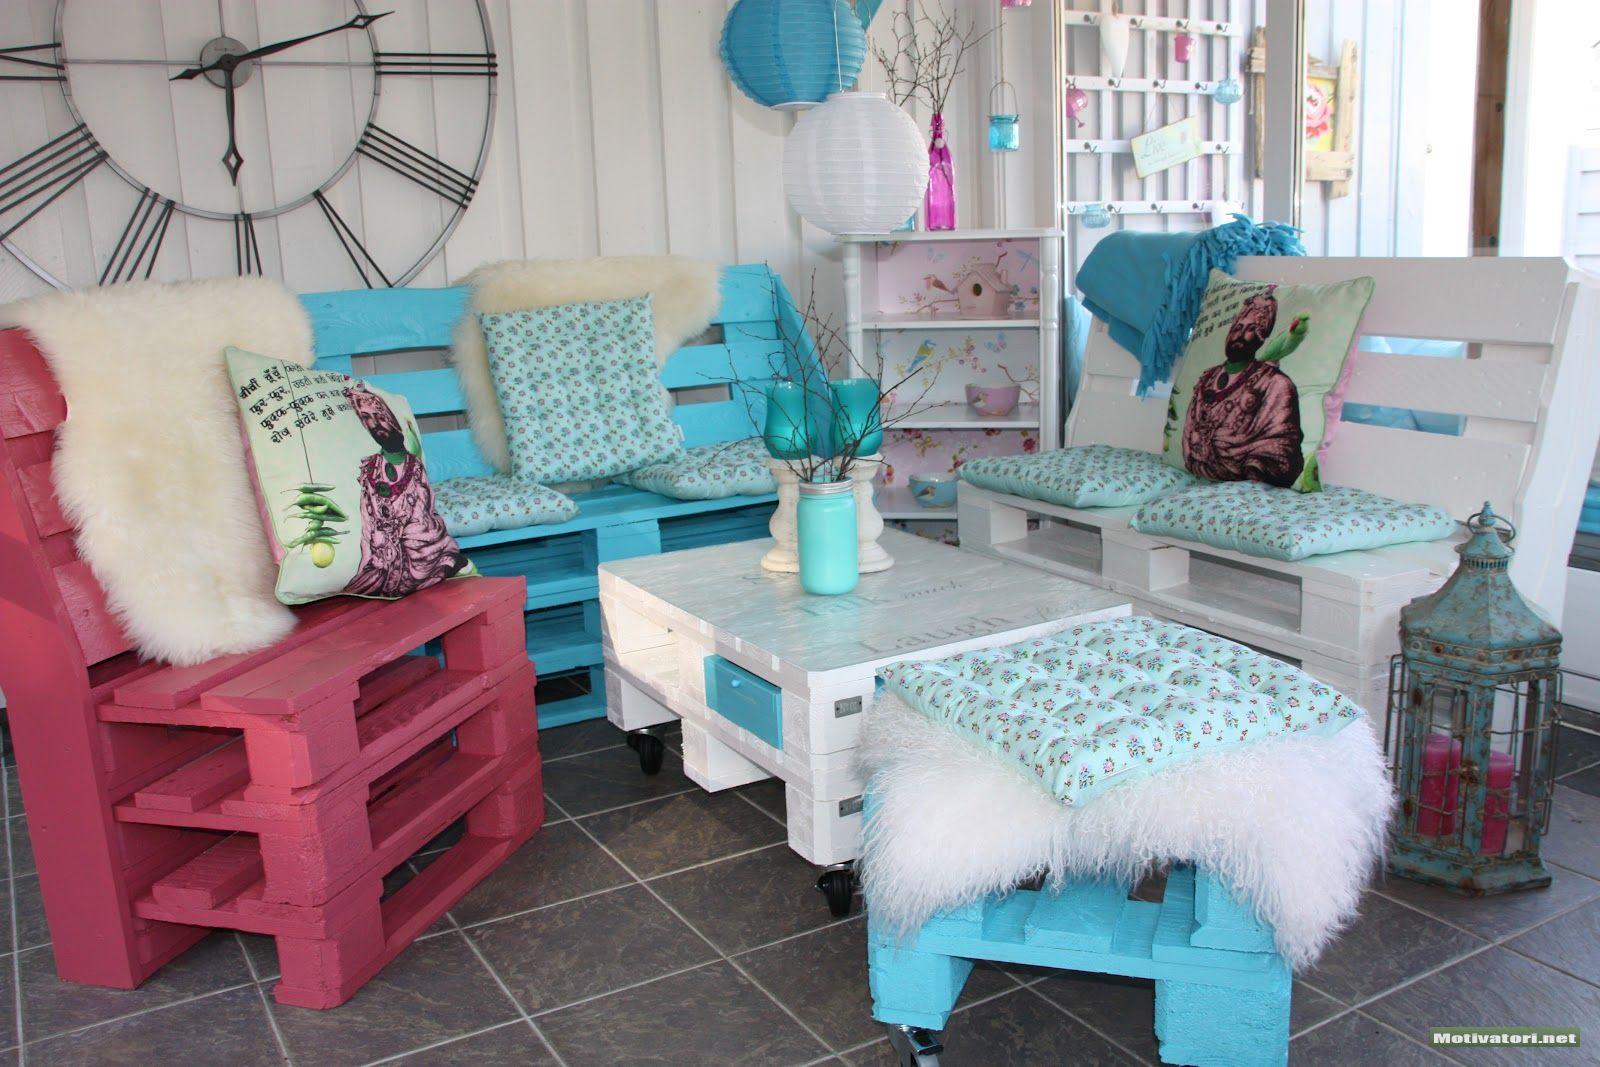 50 Best Creative Pallet Furniture Design Ideas for 2020 on Pallet Room  id=22994